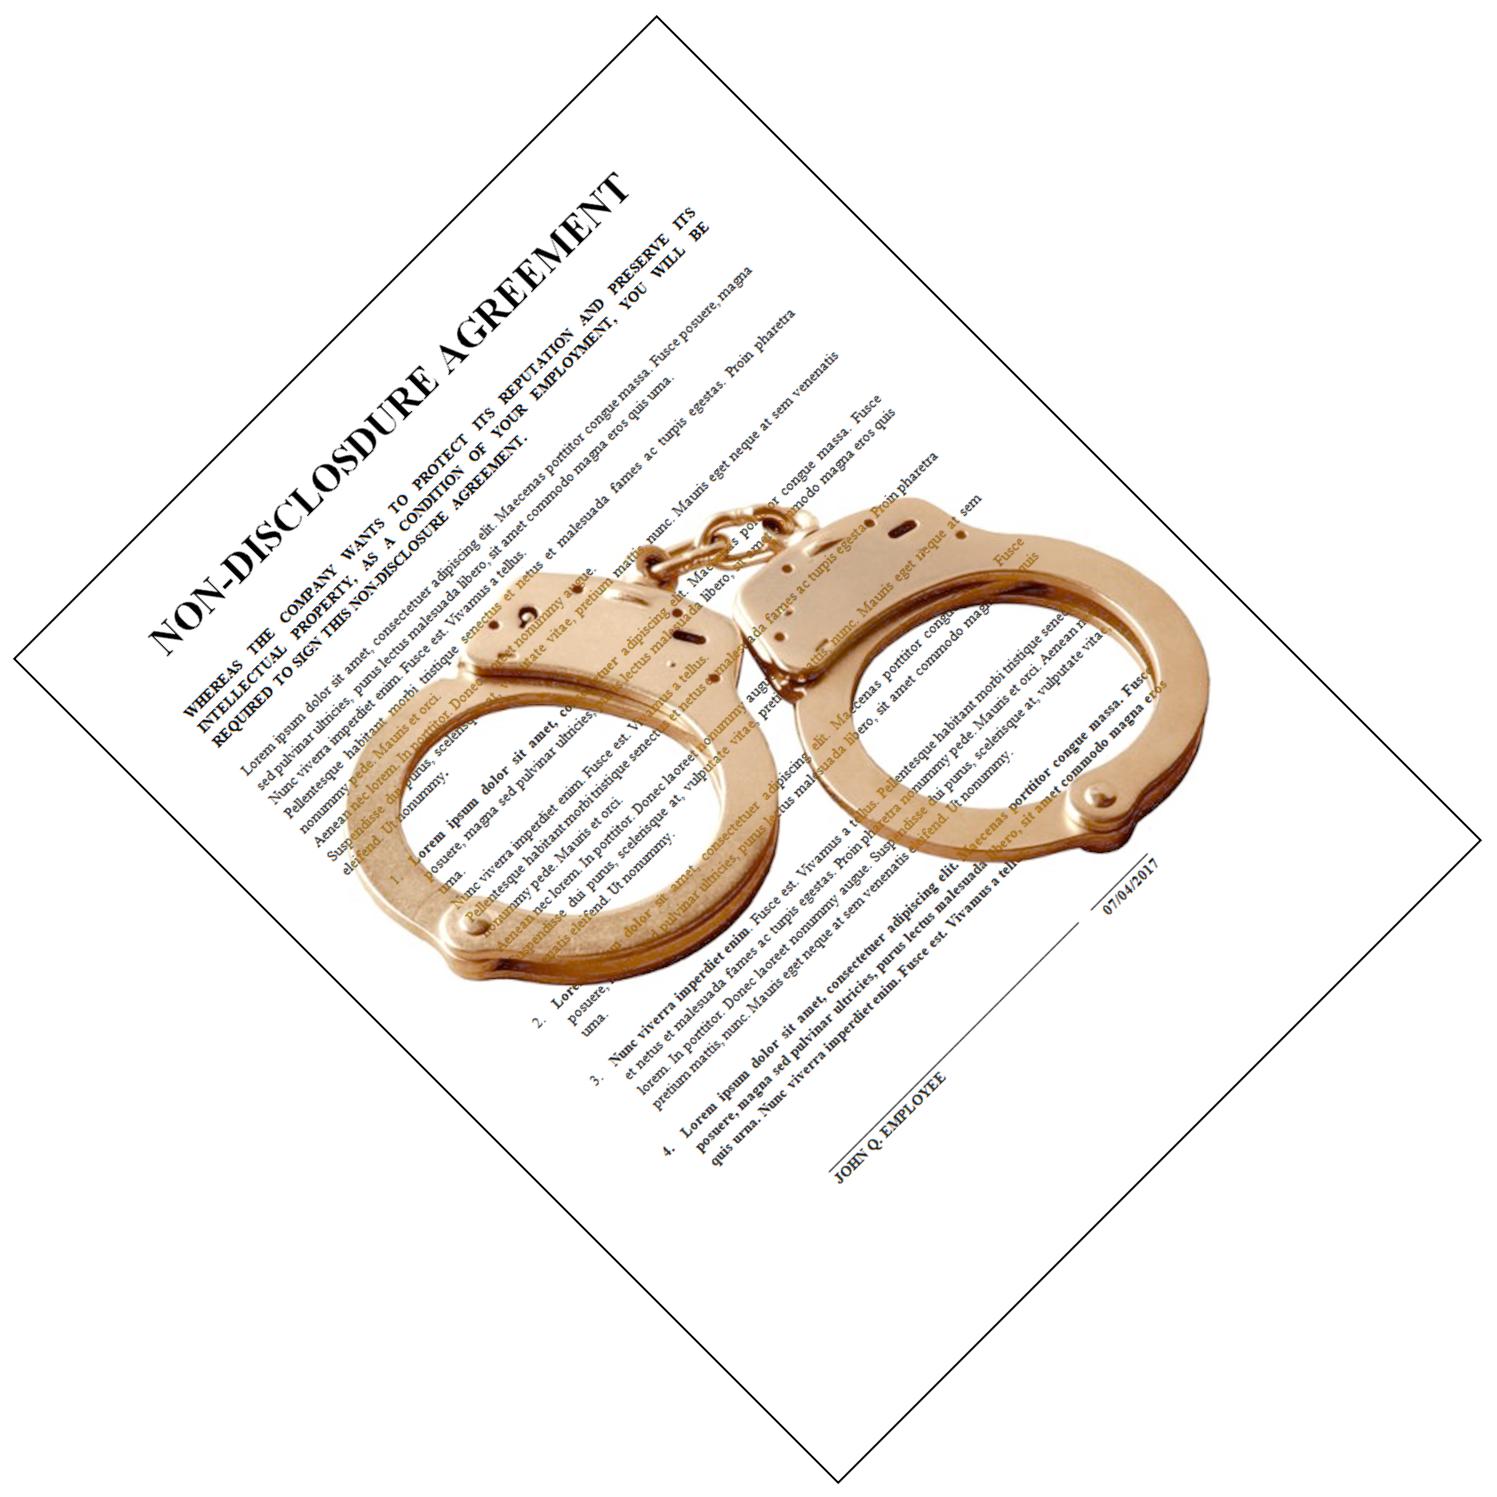 Am I Next? Non-Disclosure Agreement Handcuffs